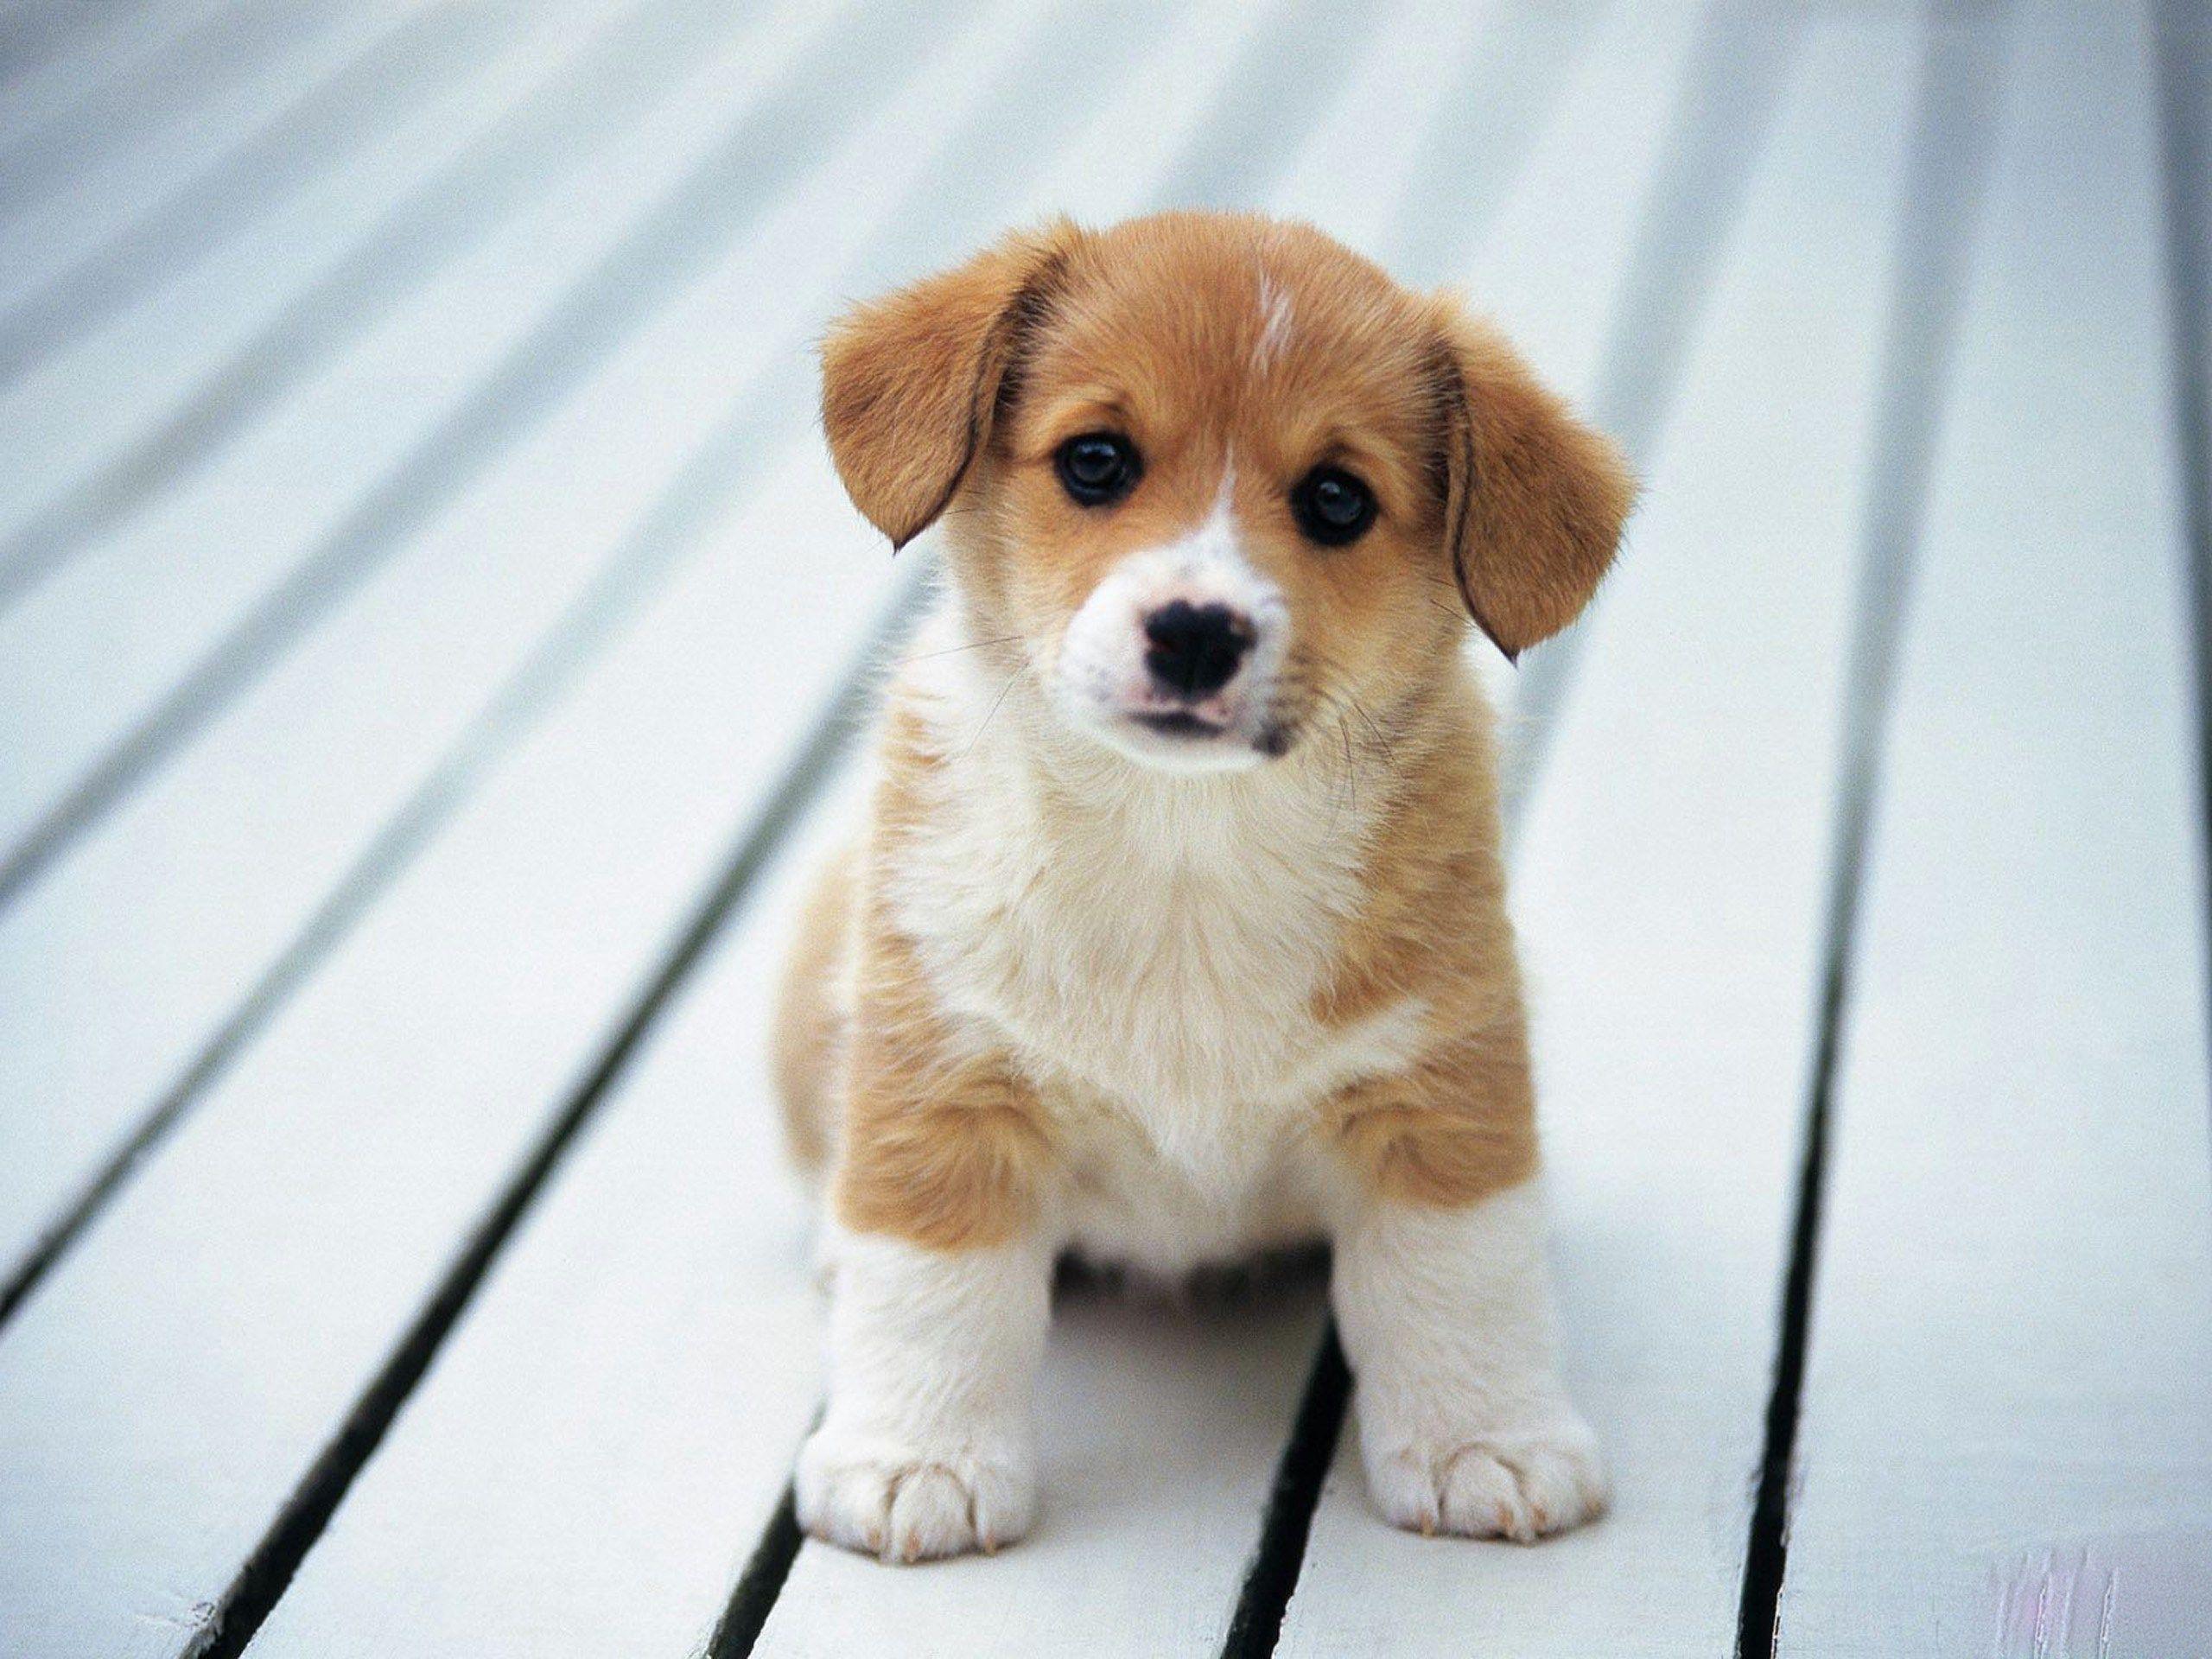 Beautiful Super Cute Beagle Adorable Dog - b5e226e34693b9428a6e76dd9c92d7d1  Snapshot_78424  .jpg